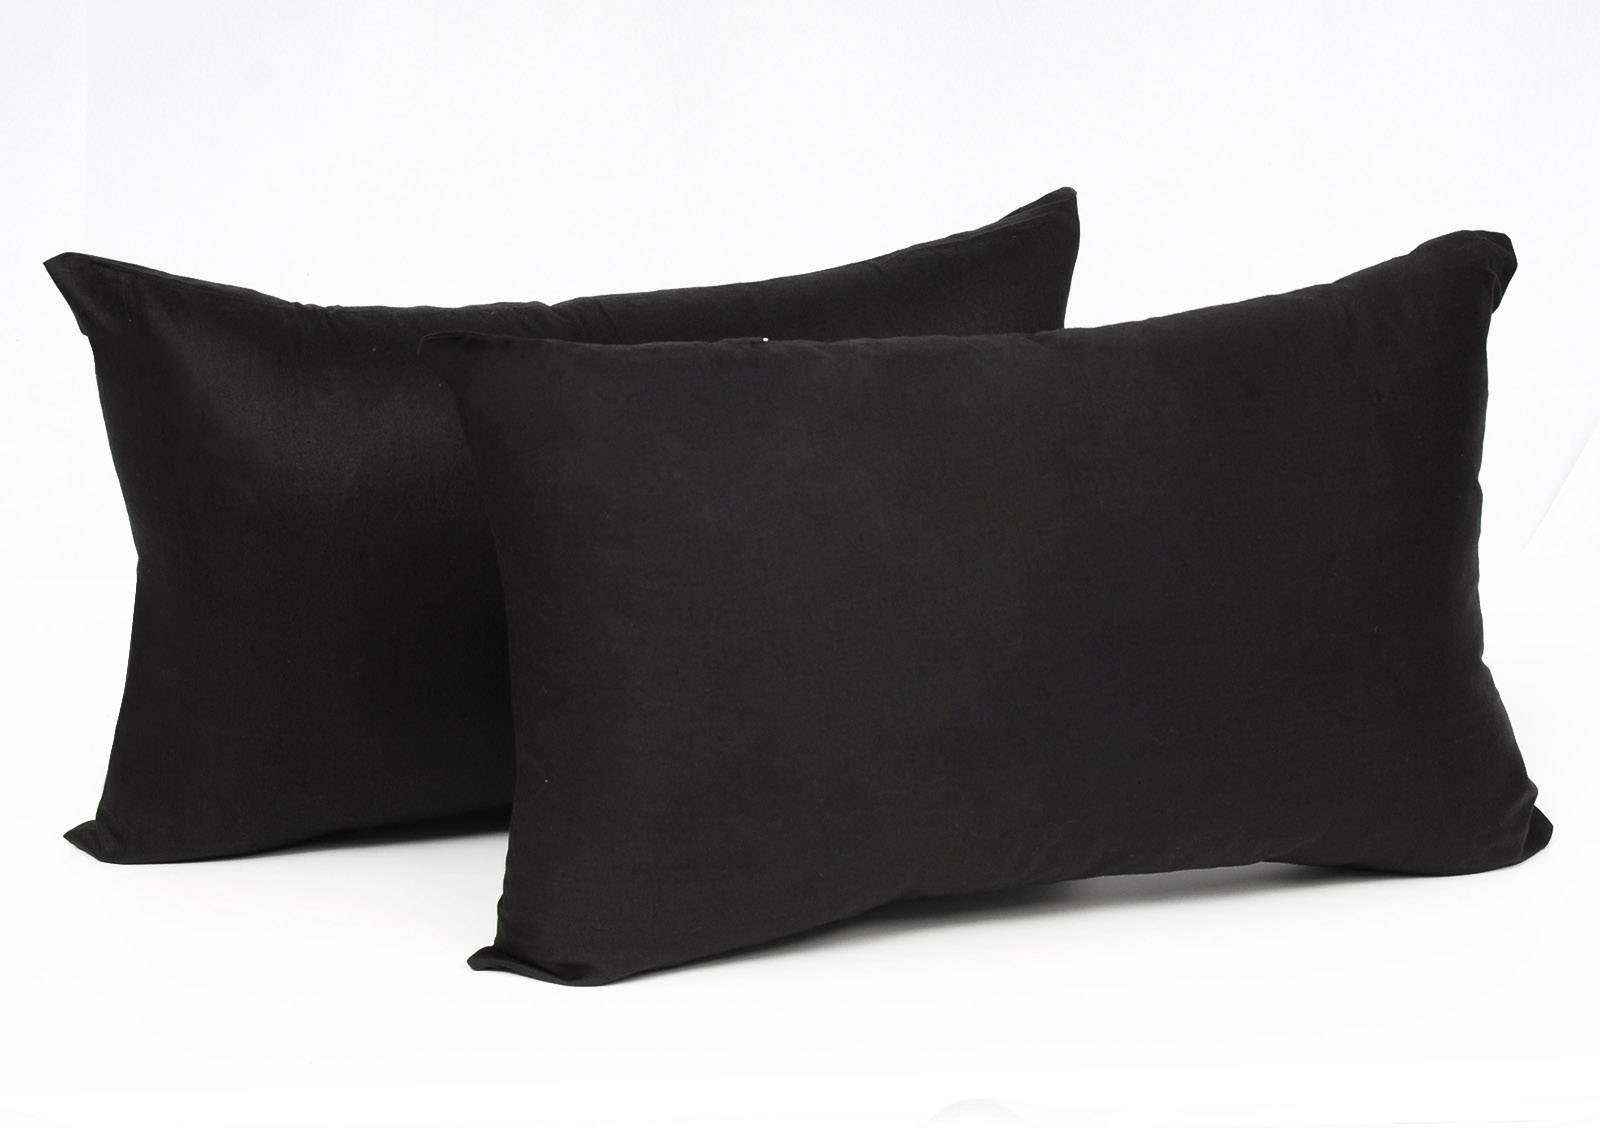 kissenbezug kissenh lle sofakissen baumwolle kopfkissen cover bez ge case 204 ebay. Black Bedroom Furniture Sets. Home Design Ideas